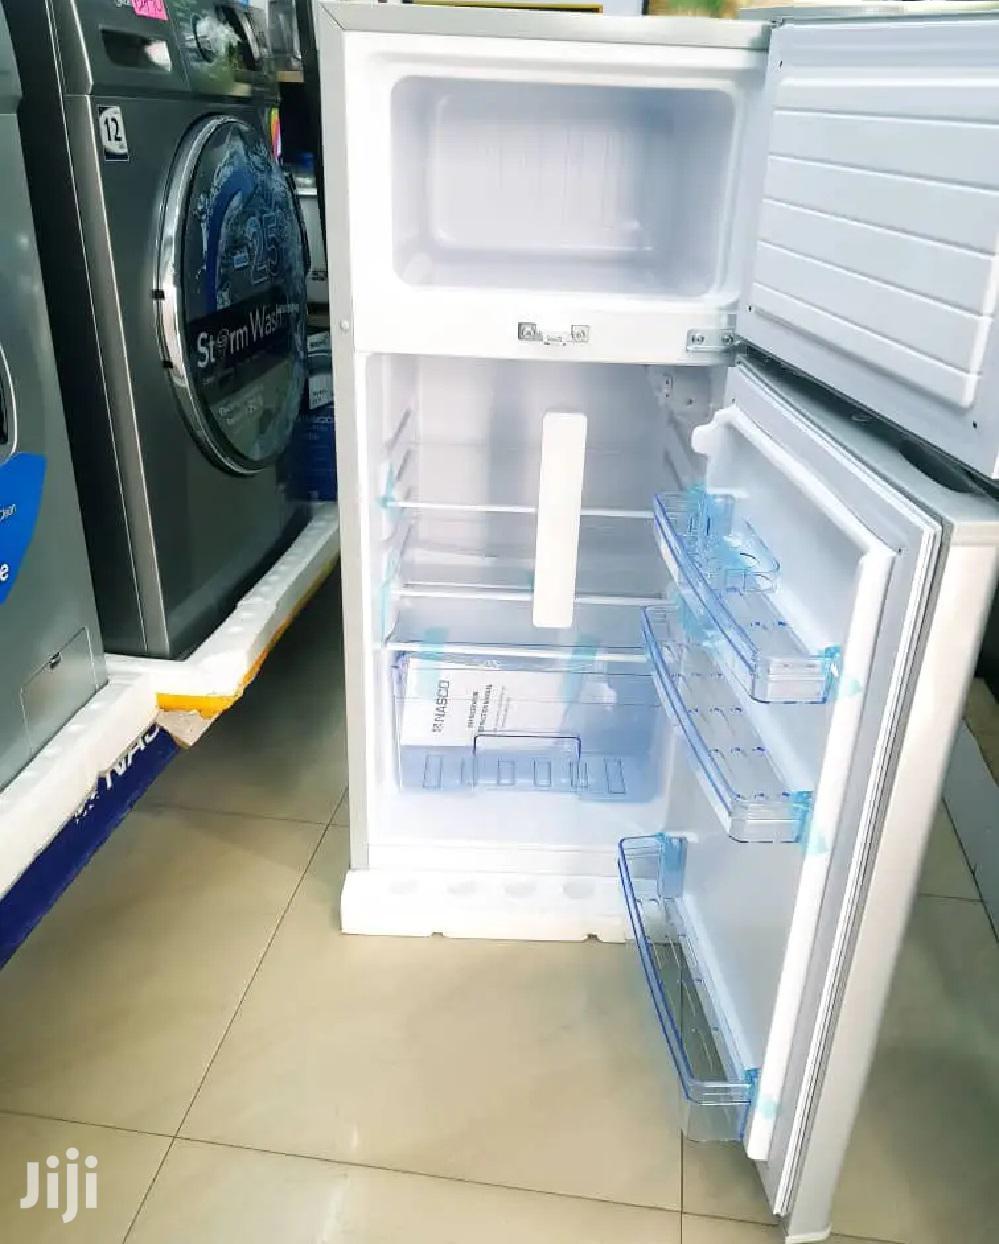 NASCO 98 Liters Top Freezer Fridge | Kitchen Appliances for sale in Roman Ridge, Greater Accra, Ghana